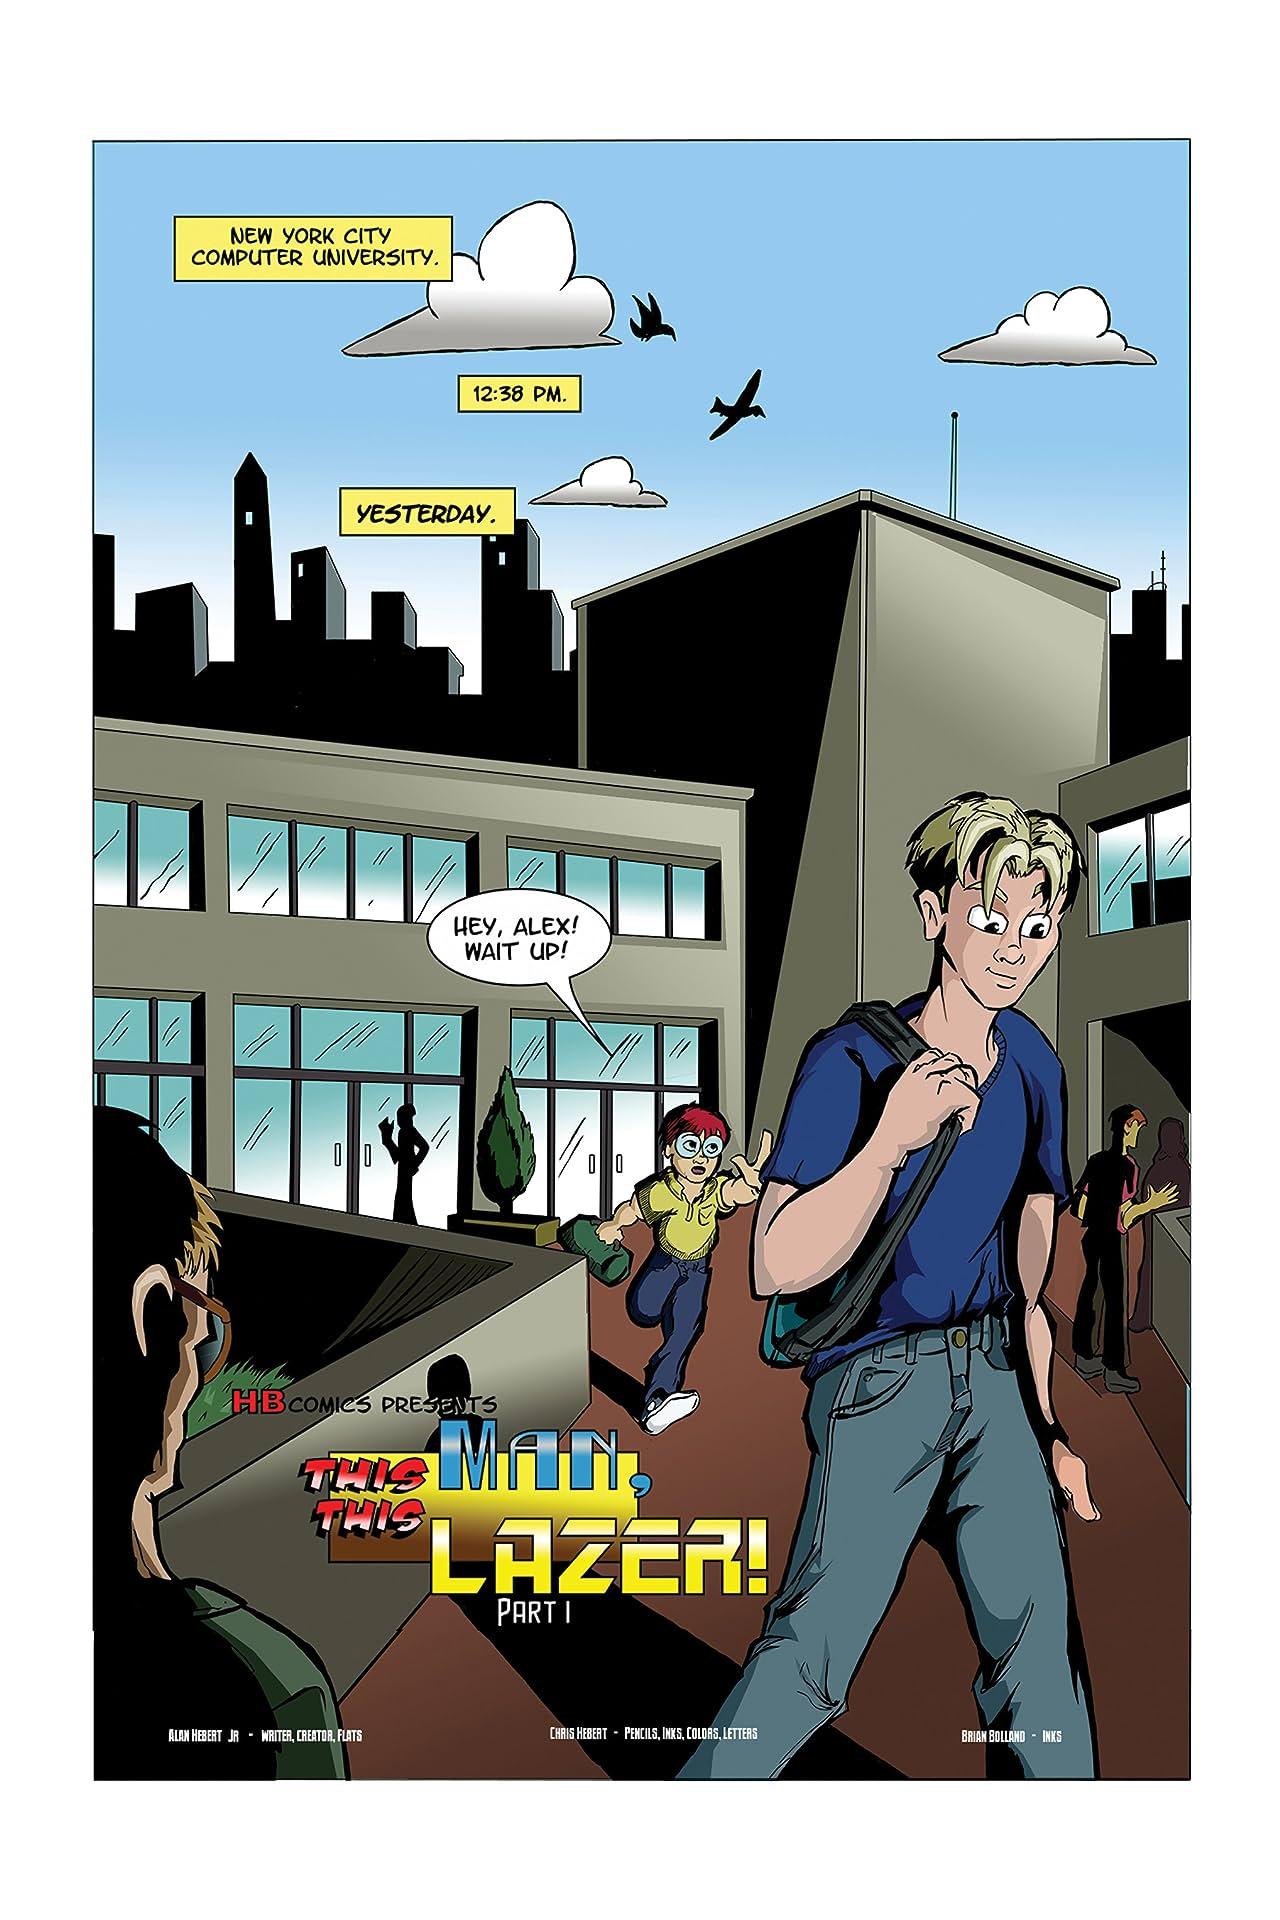 Lazerman Vol. 1: This Man, This Lazer